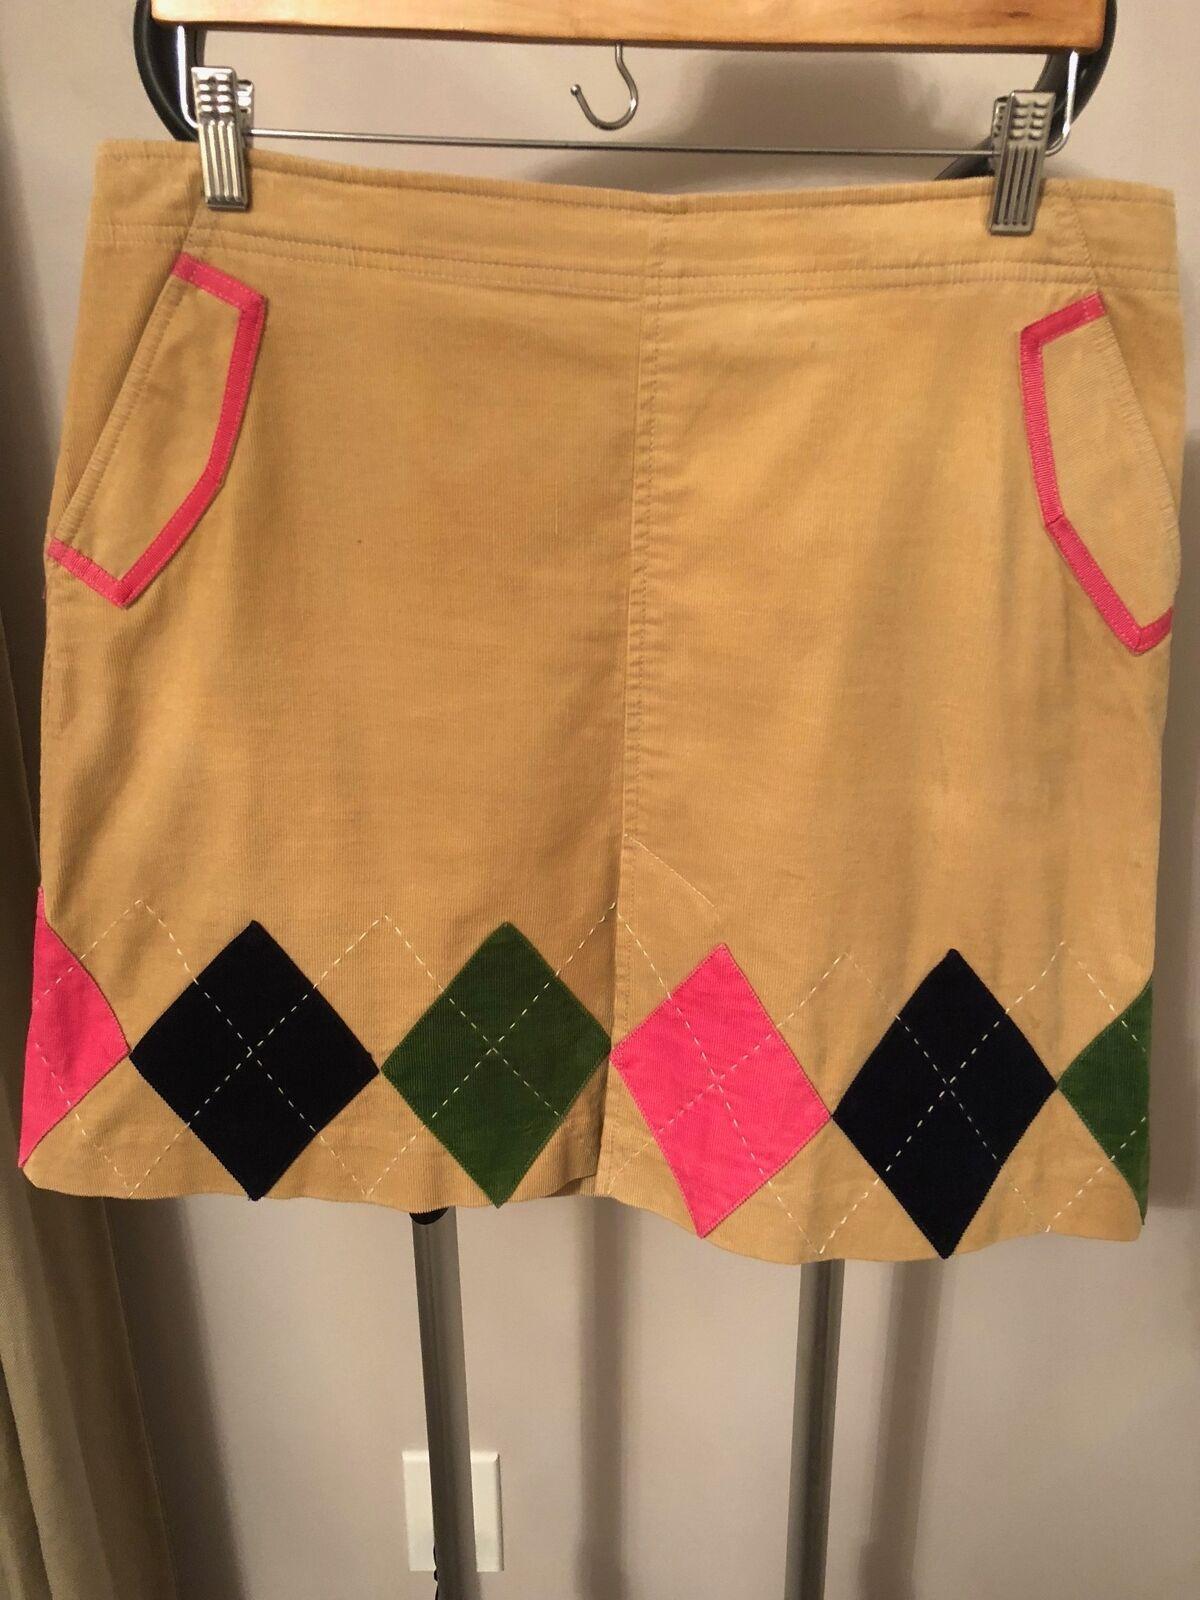 NWOT Lilly Pulitzer Tan Corduroy A-line Diamond Applique Skirt SZ 10